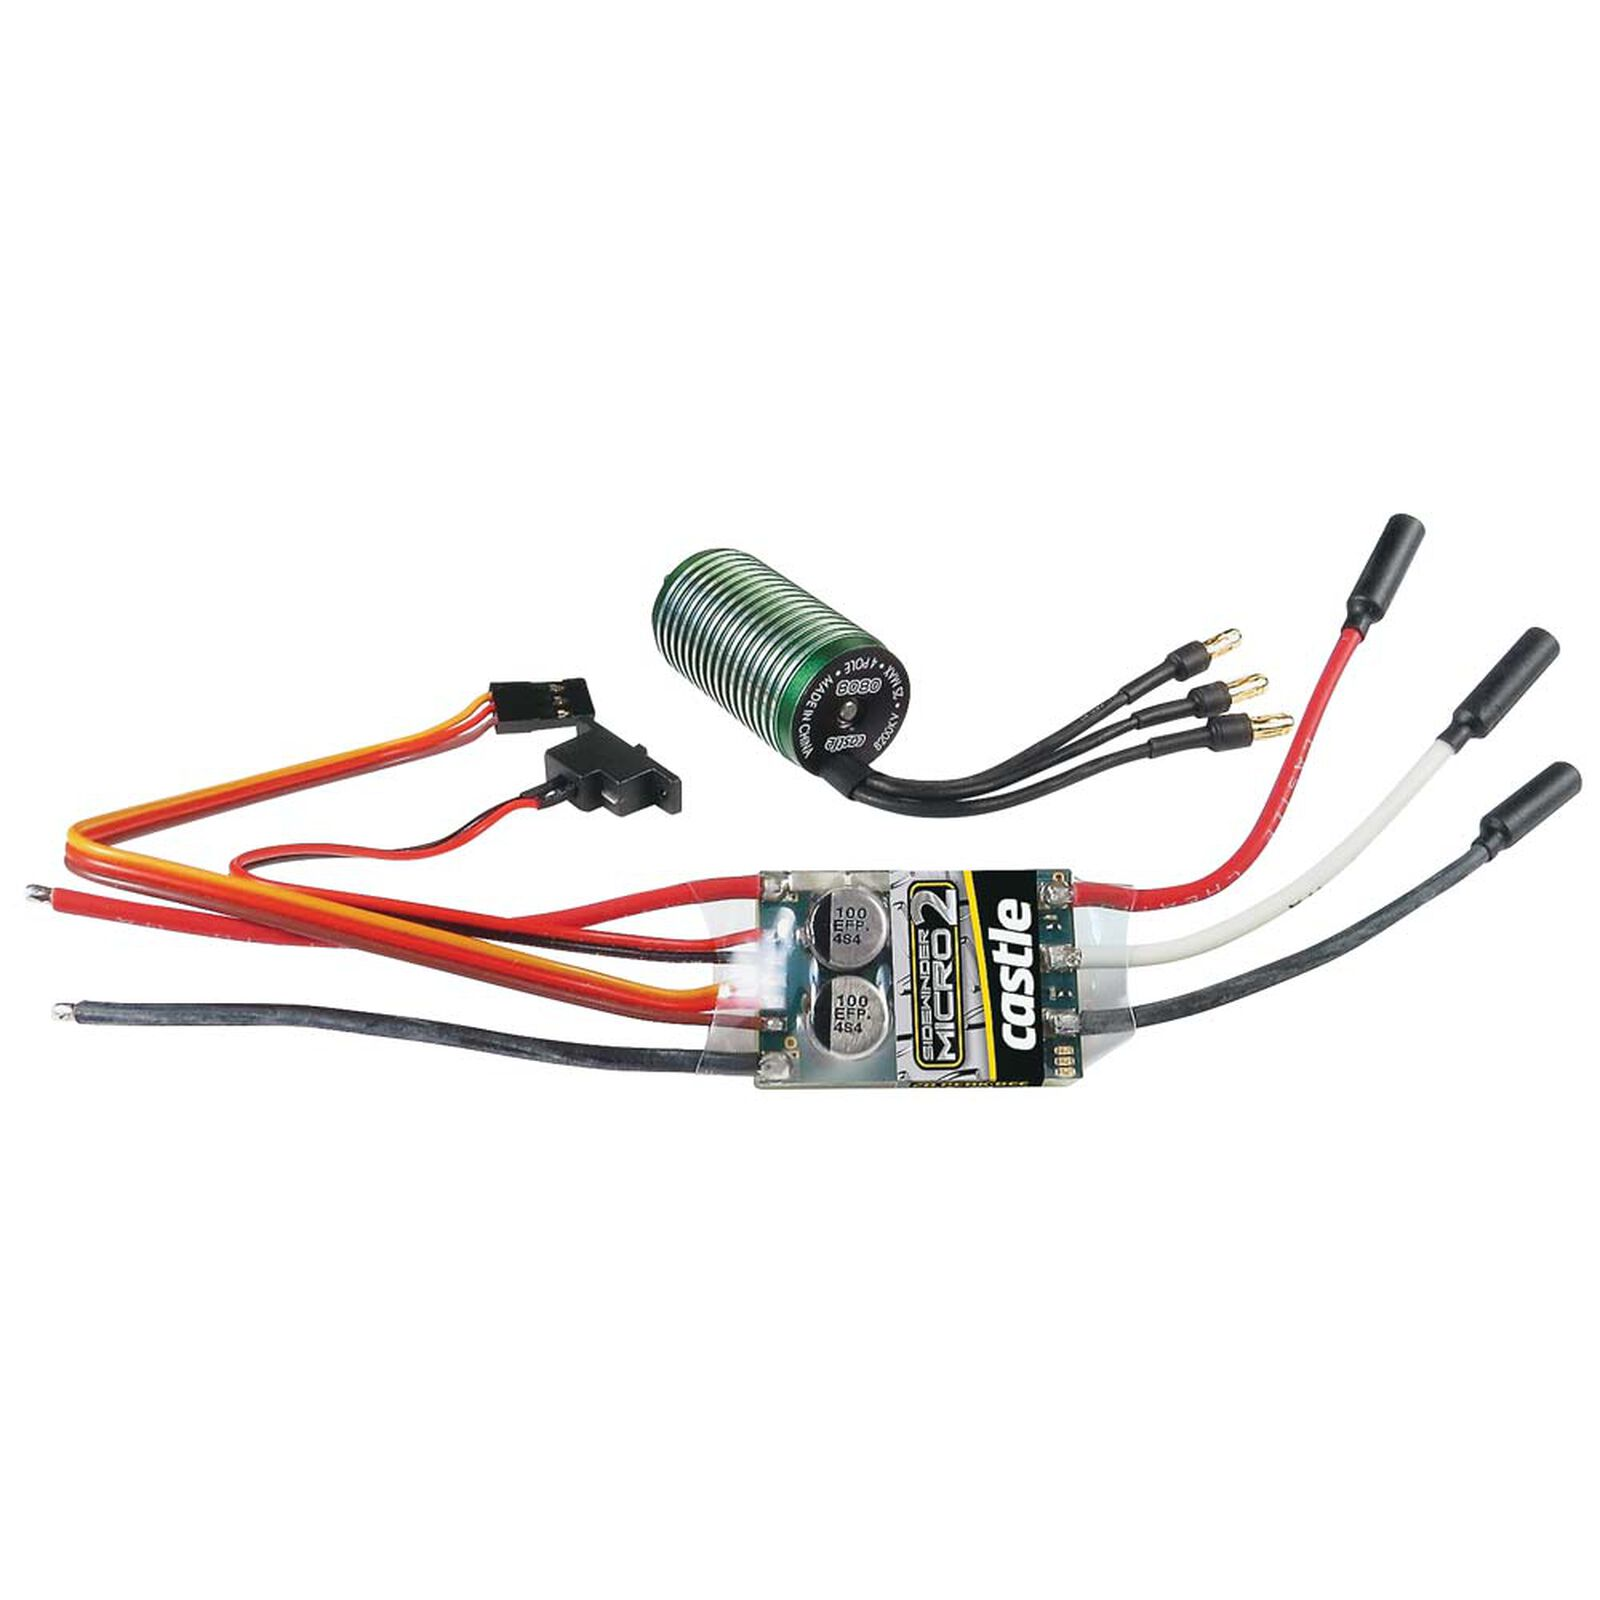 1/18 Sidewinder Micro 2 with 4100Kv Motor